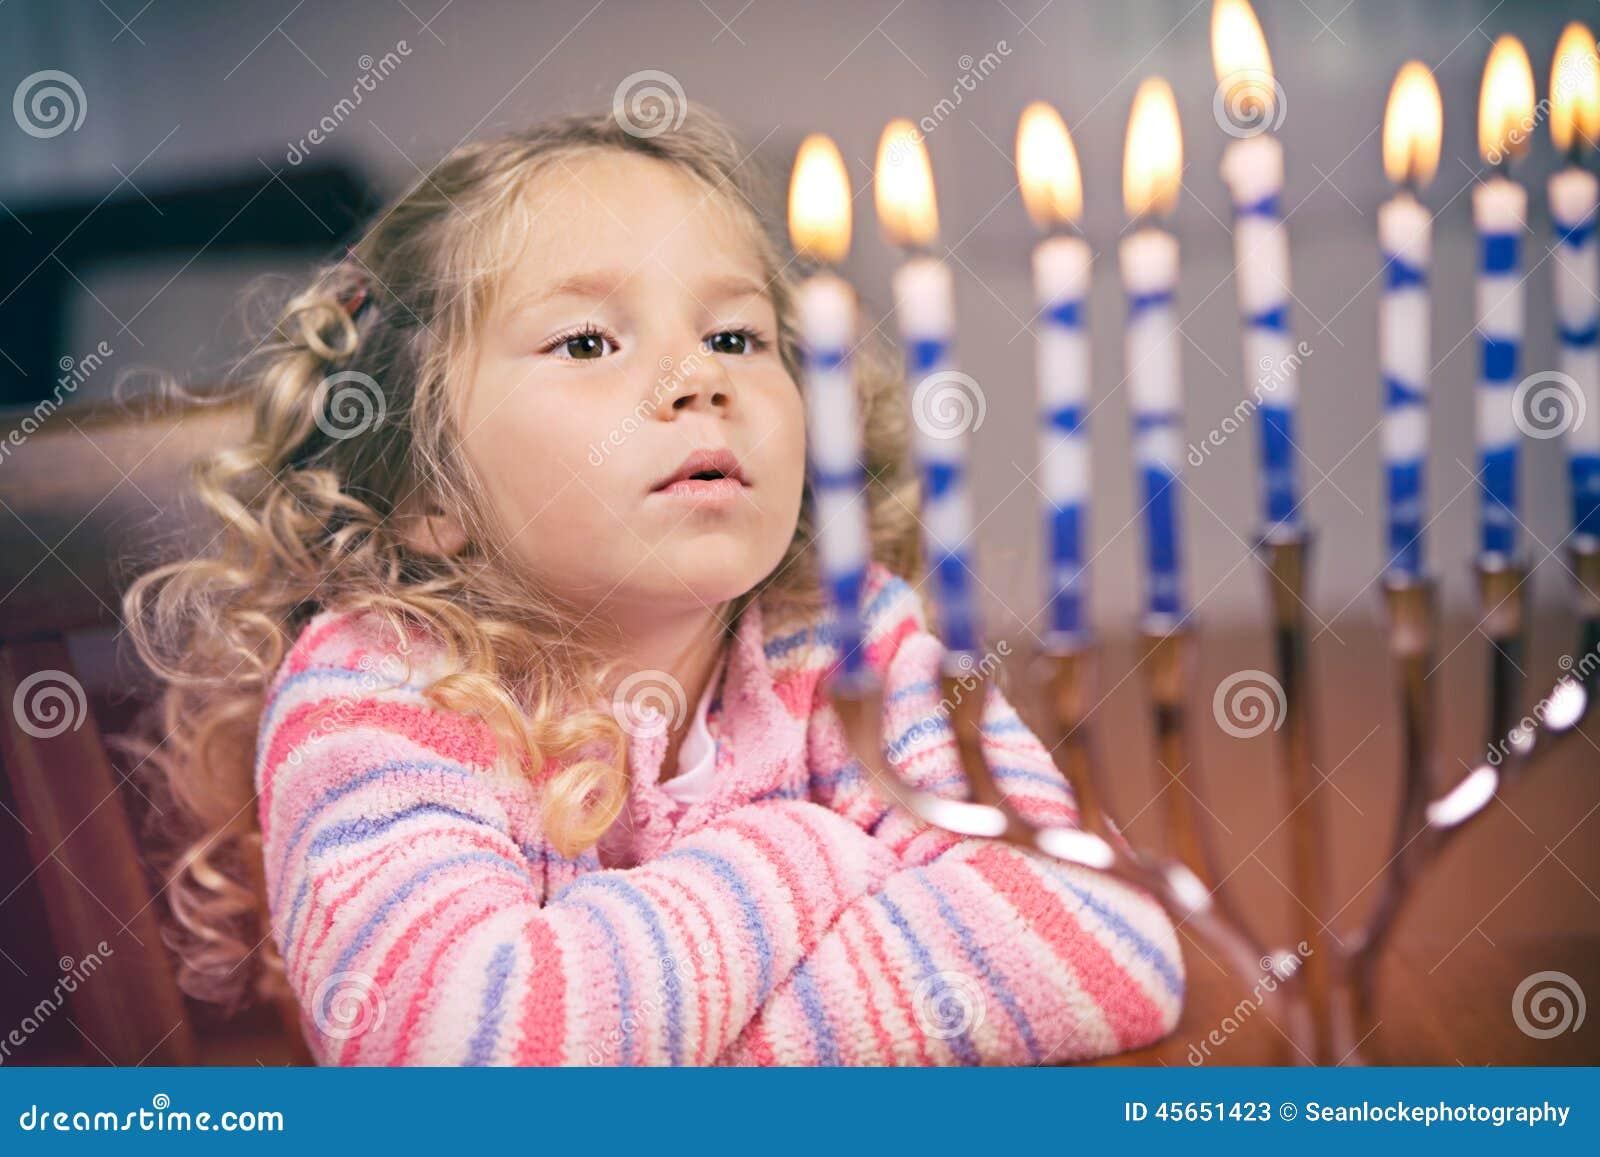 Hanukkah: Little Girl Looks At Lit Hanukkah Candles